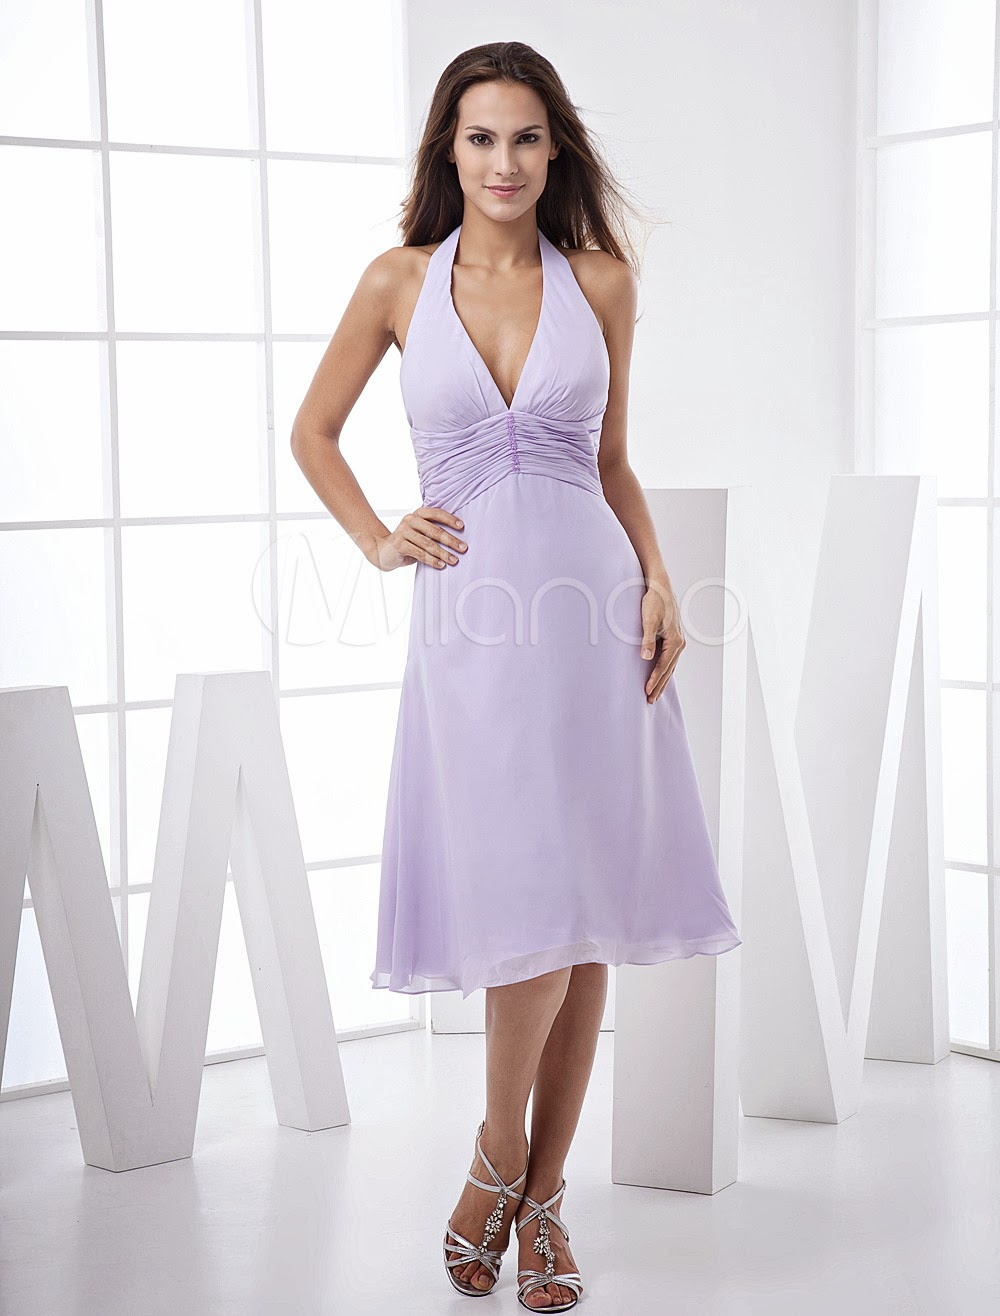 China Wholesale Dresses - V-Neck Backless Satin Chiffon Summer Prom Dress